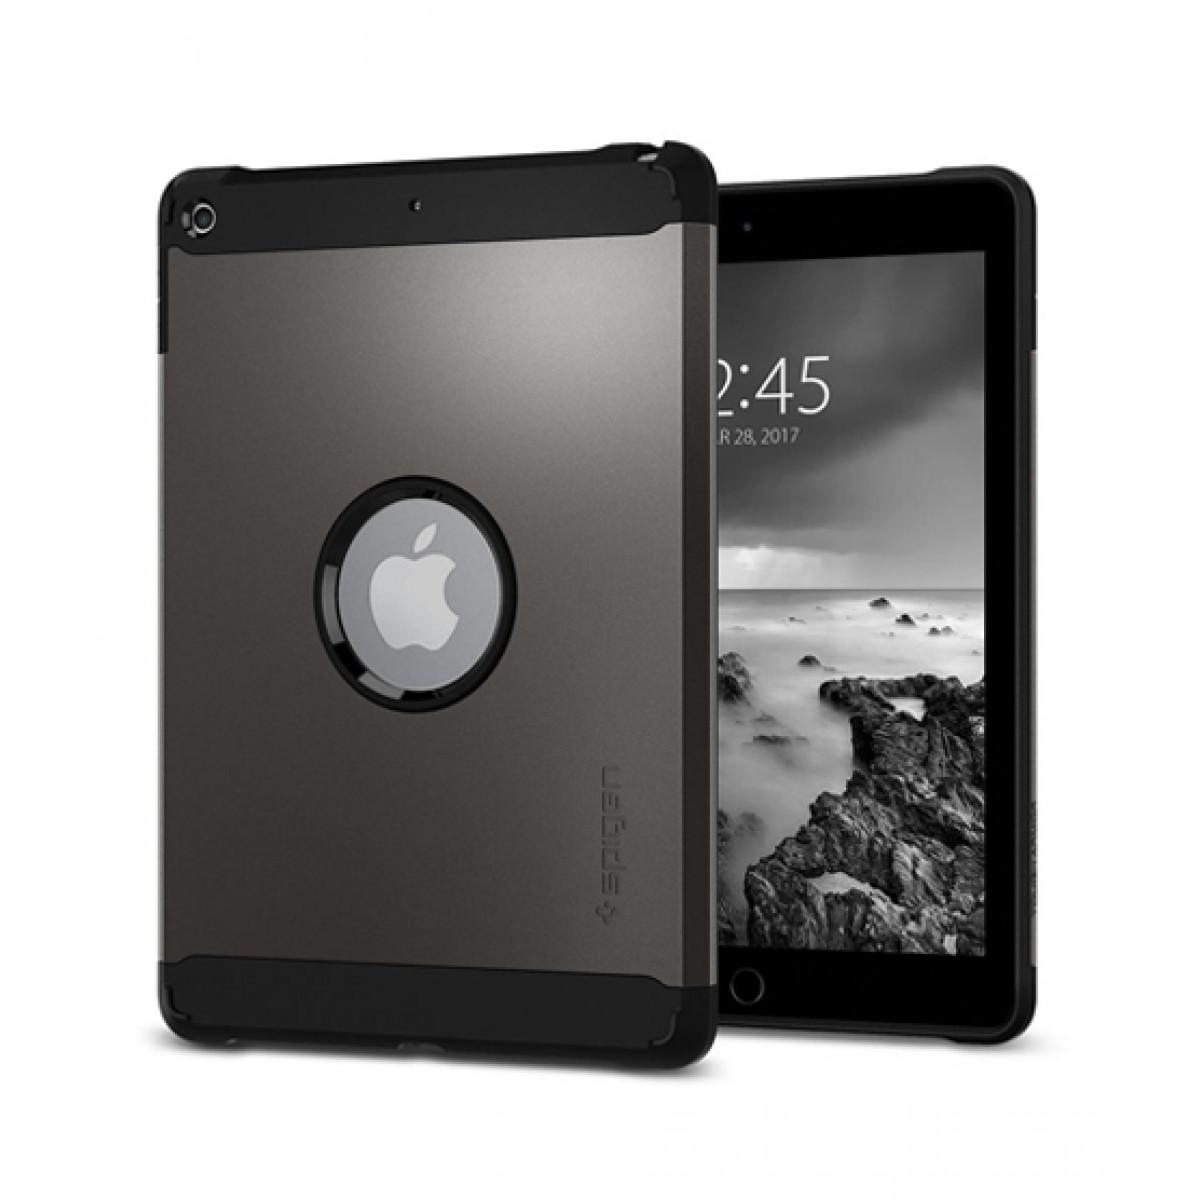 quality design 563eb da010 Spigen Tough Armor Gunmetal Case For iPad Pro 9.7